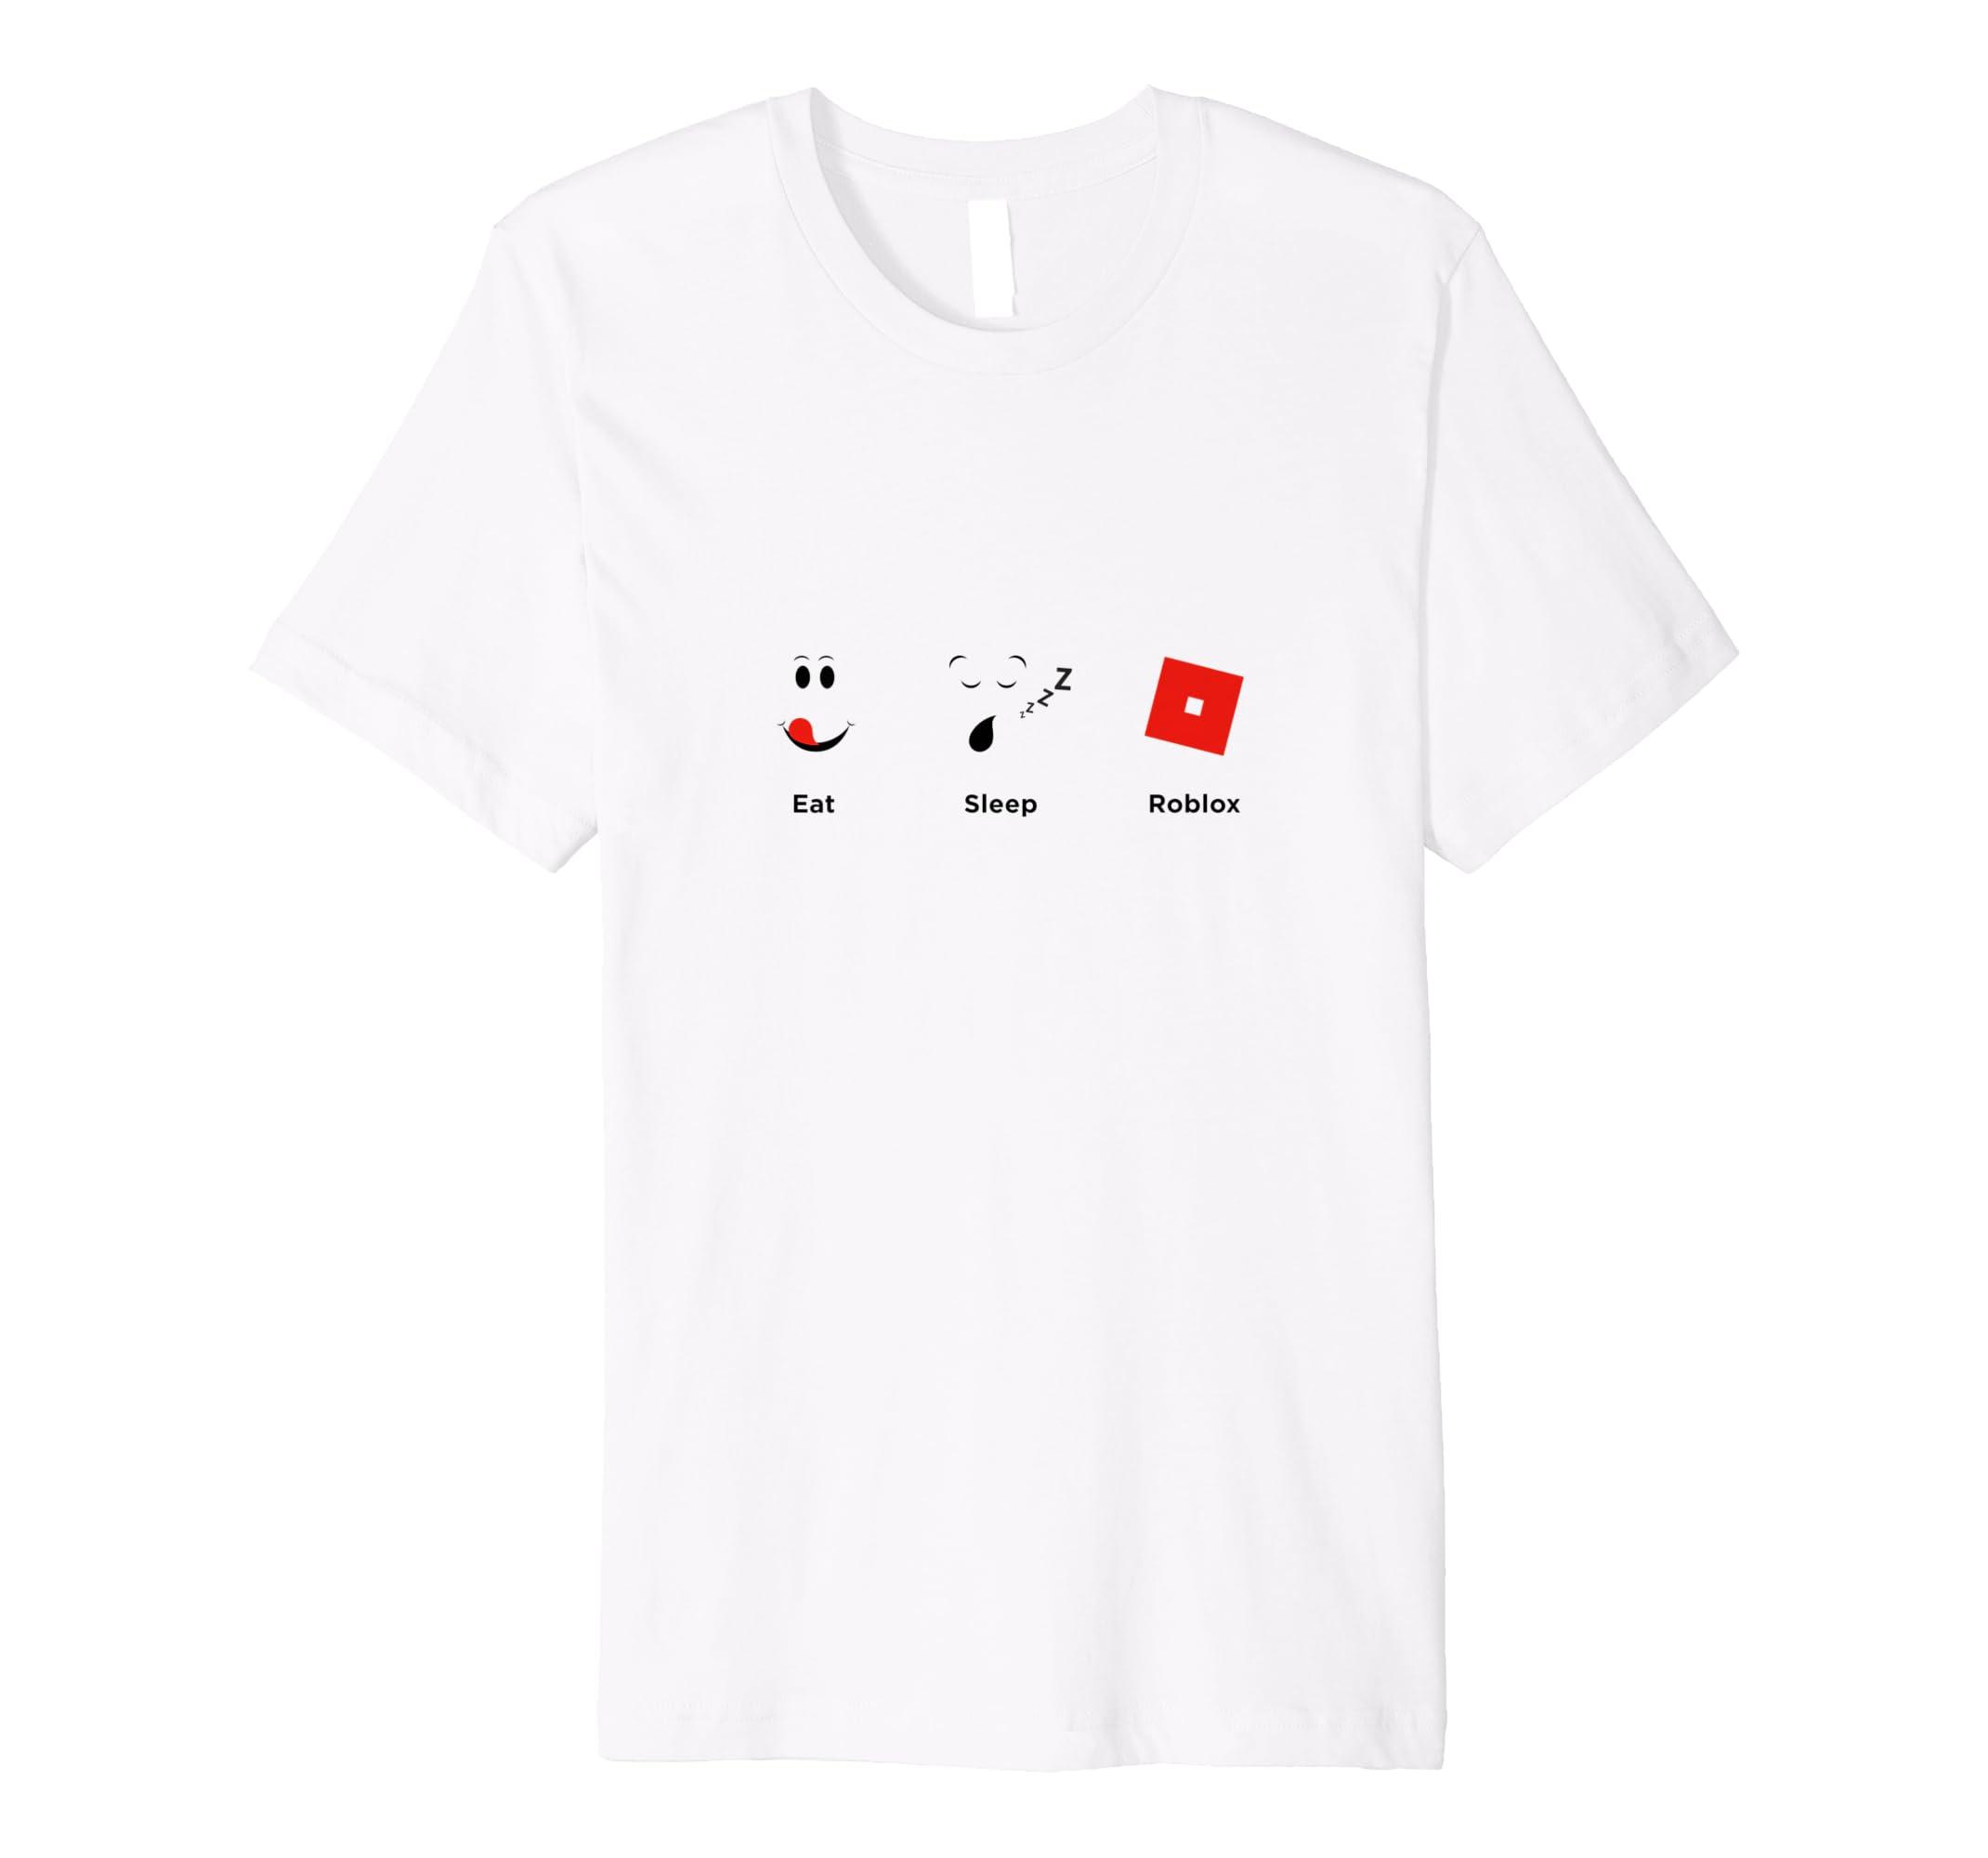 6449f8bc5c78d Eat sleep roblox shirt clothing png 2140x2000 Roblox sleep